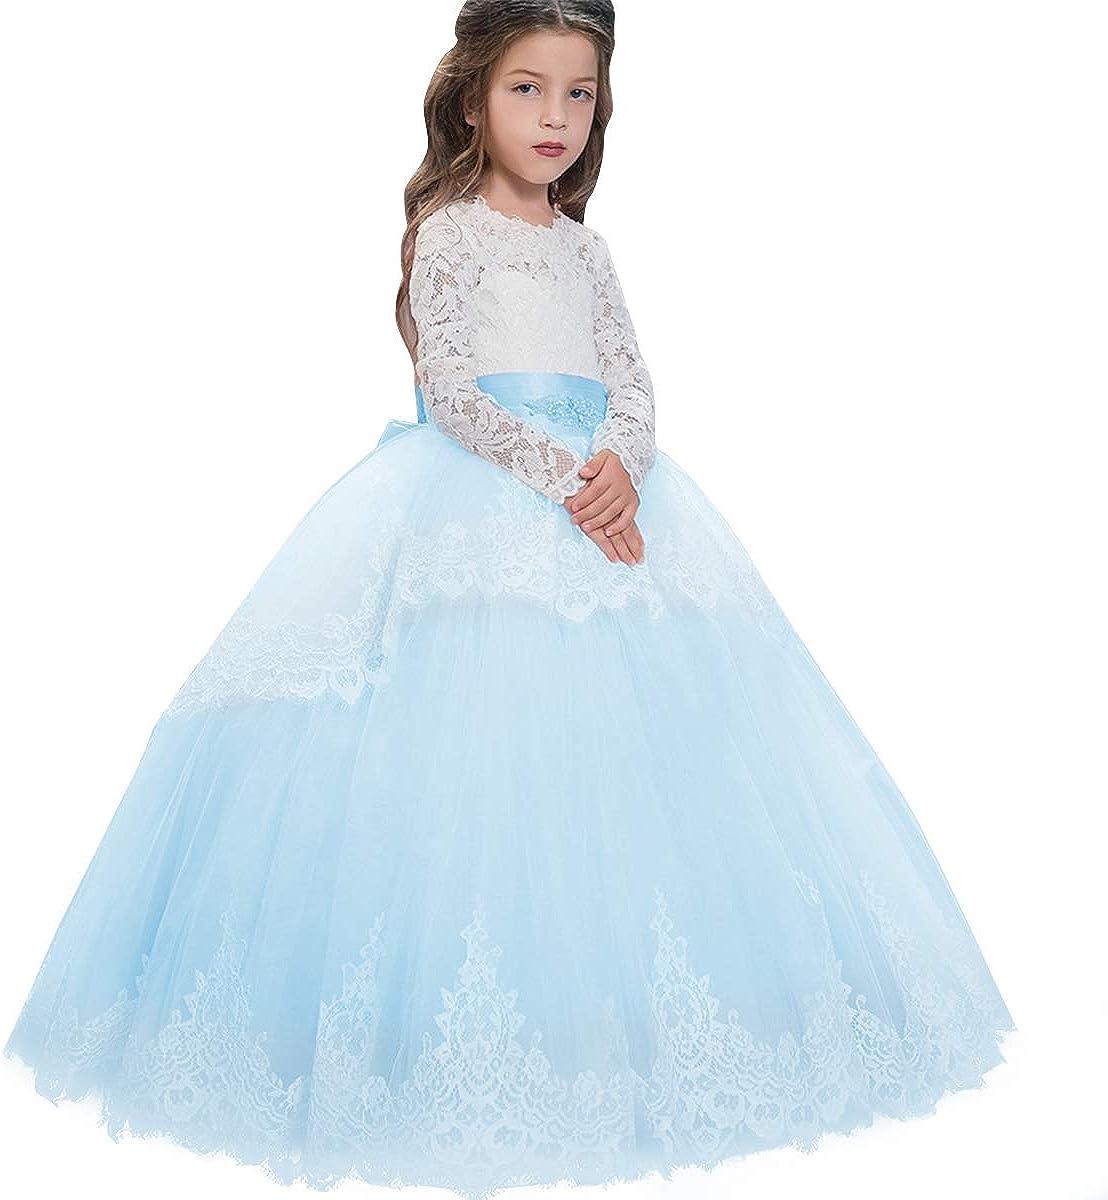 Kids Baby Girls Flower Lace Tulle Tutu Dress Princess Party Wedding Bridesmaid